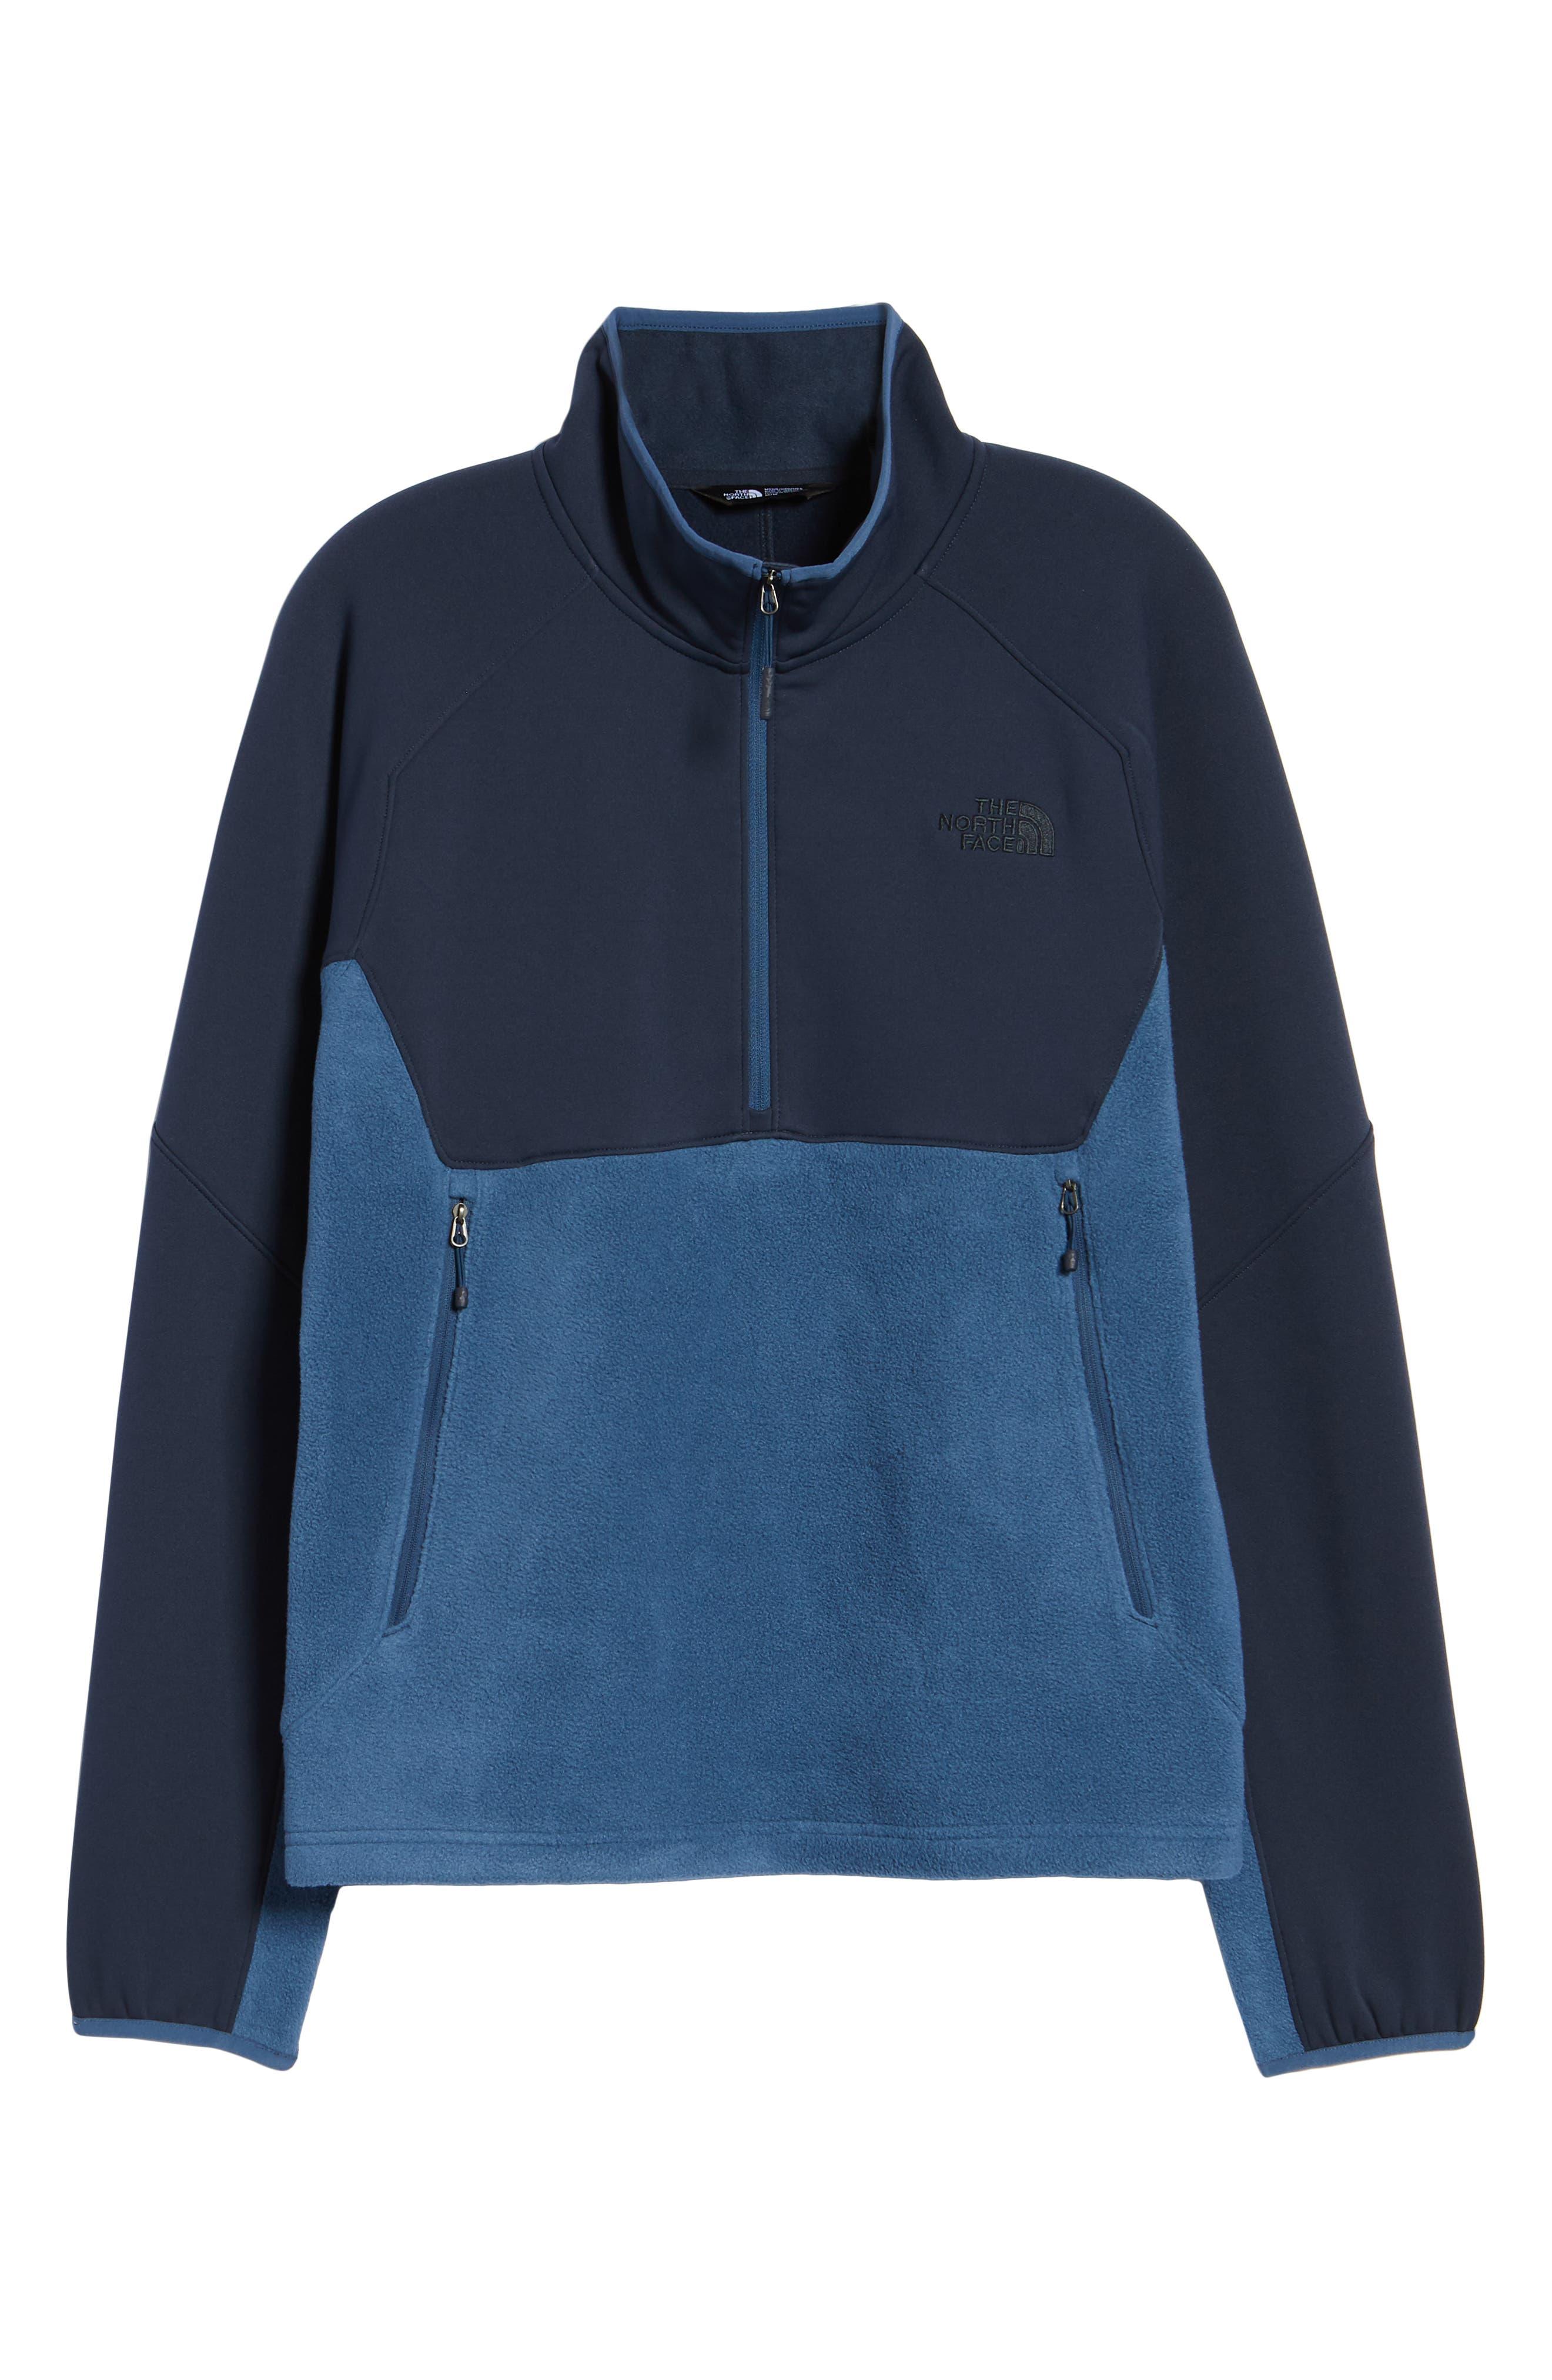 Tolmiepeak Hybrid Half-Zip Pullover,                             Alternate thumbnail 7, color,                             SHADY BLUE/ URBAN NAVY